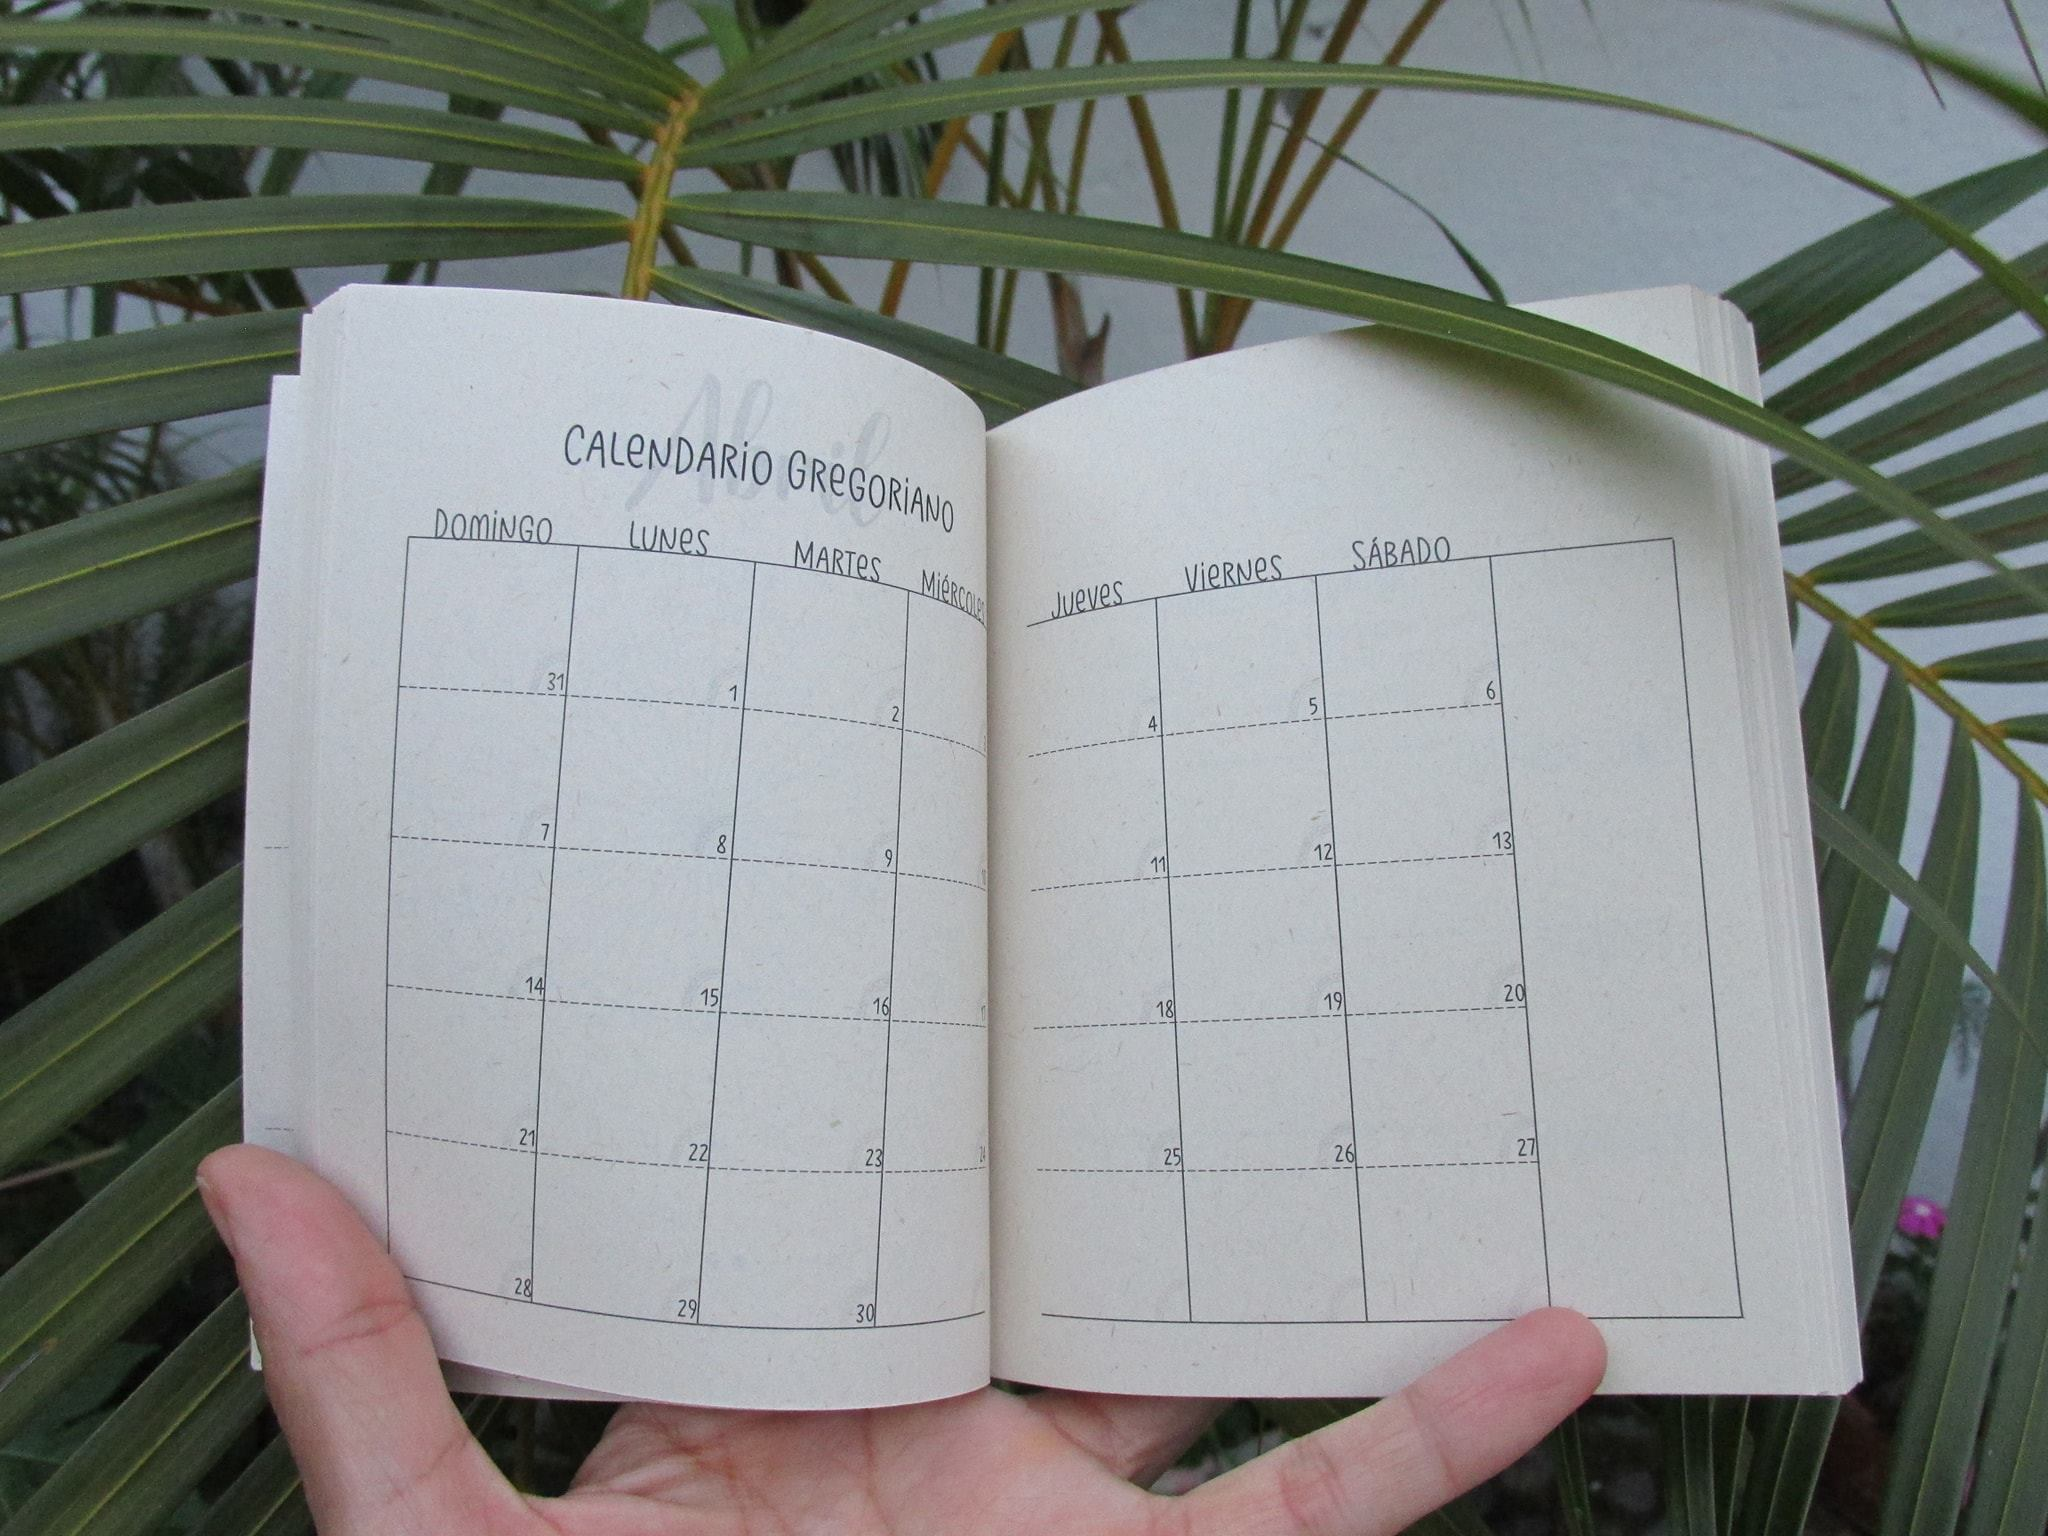 calendario gregoriano 2019